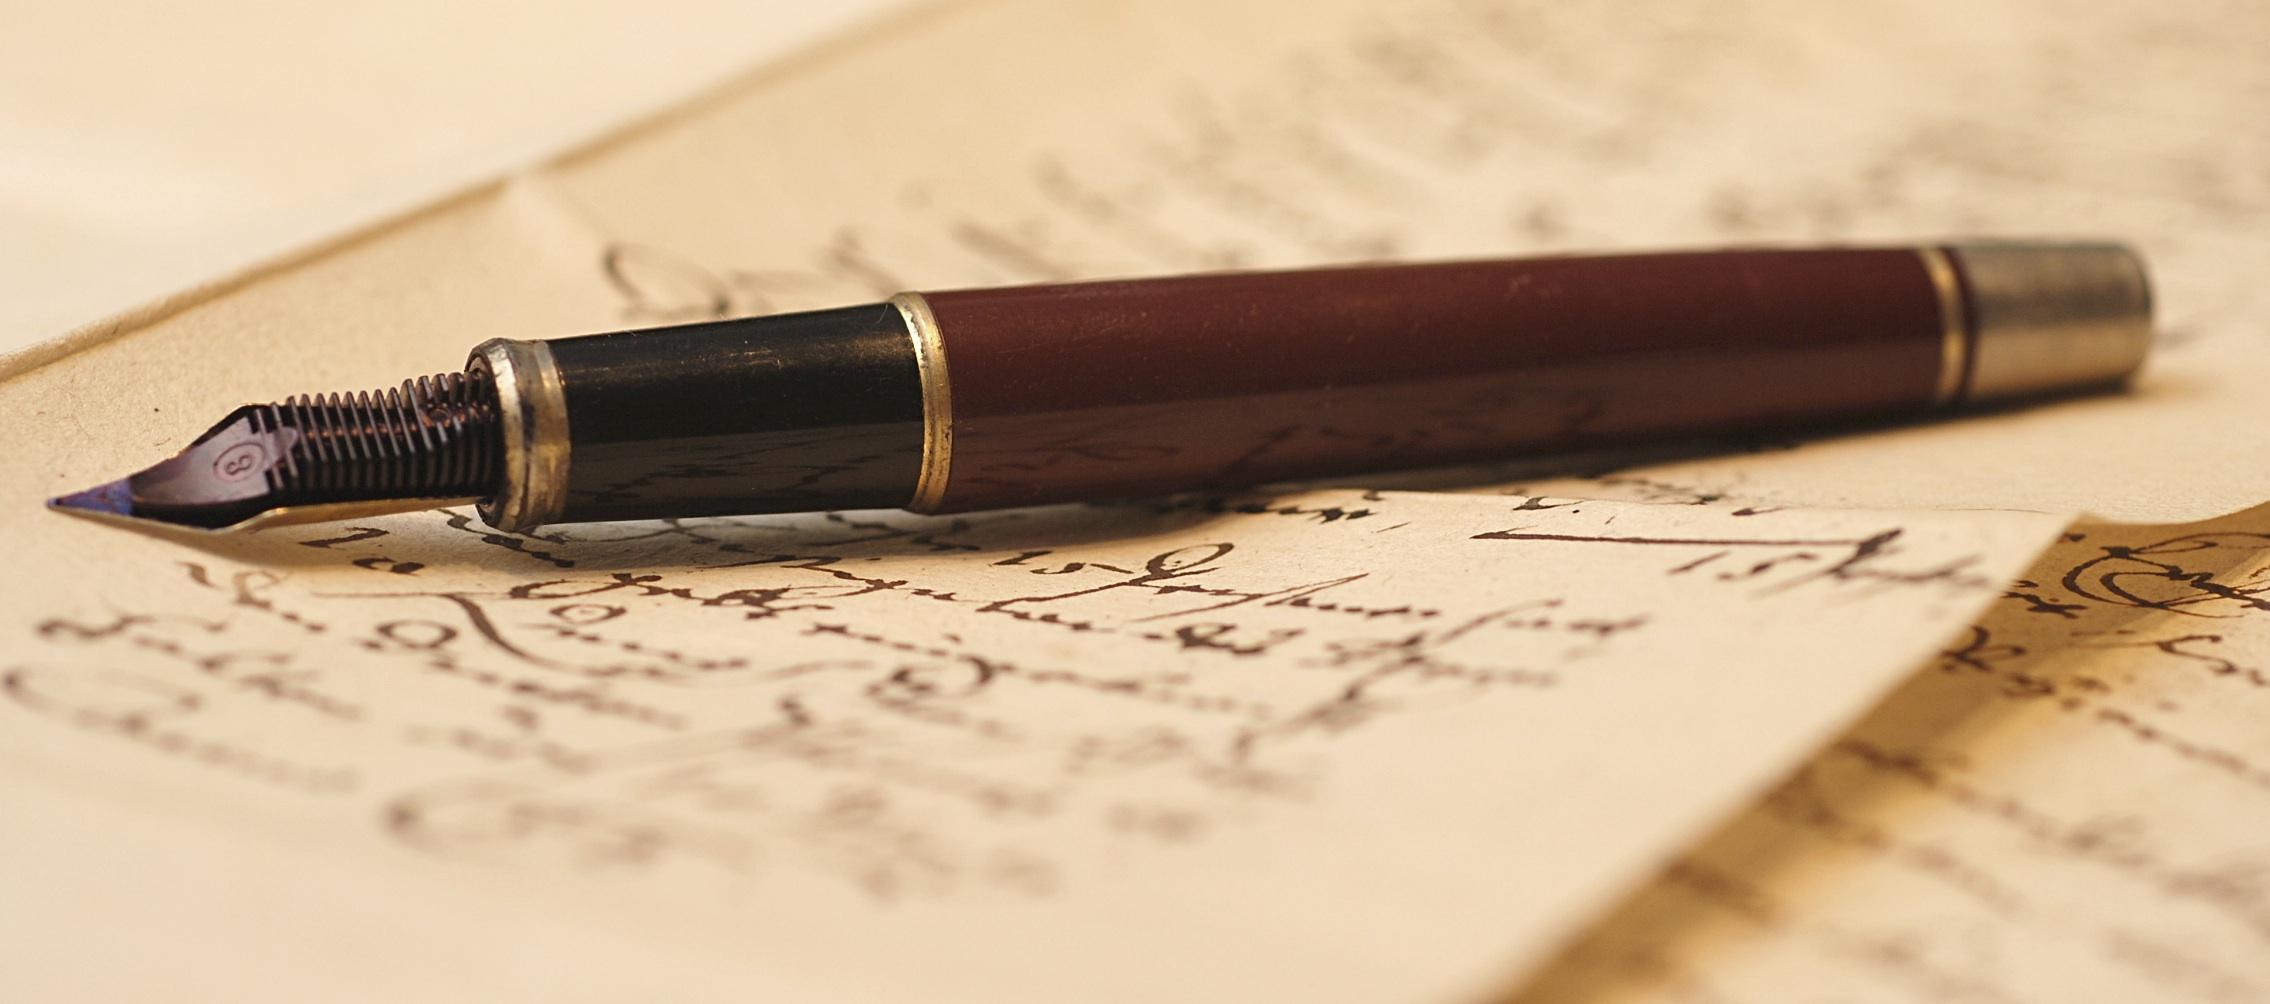 good writing skills is a key to good social media internet writer